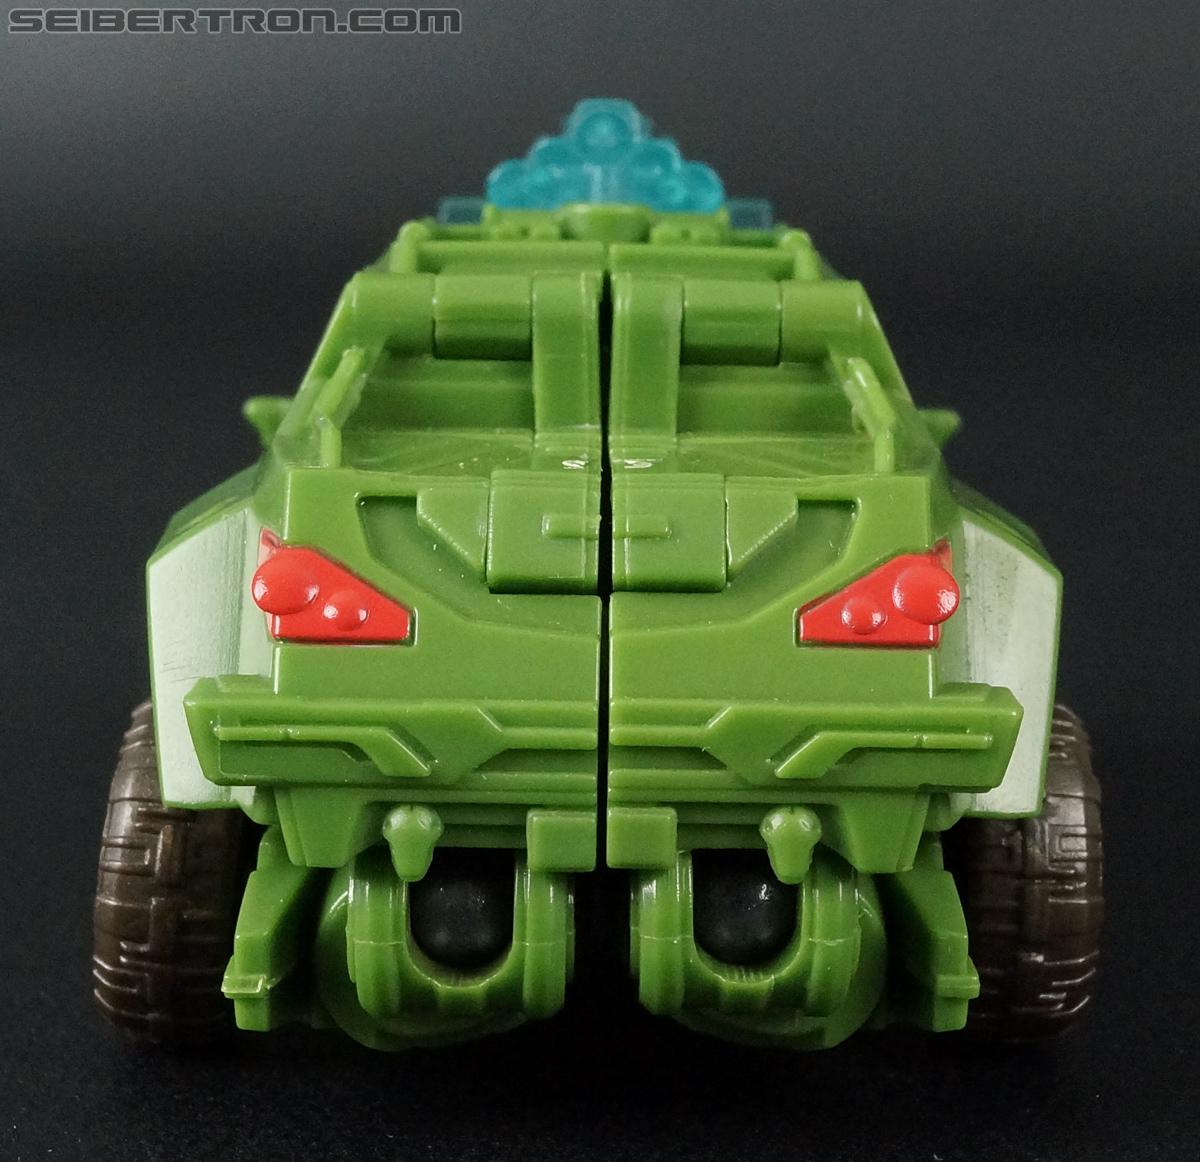 Transformers Prime: Cyberverse Bulkhead (Image #29 of 150)